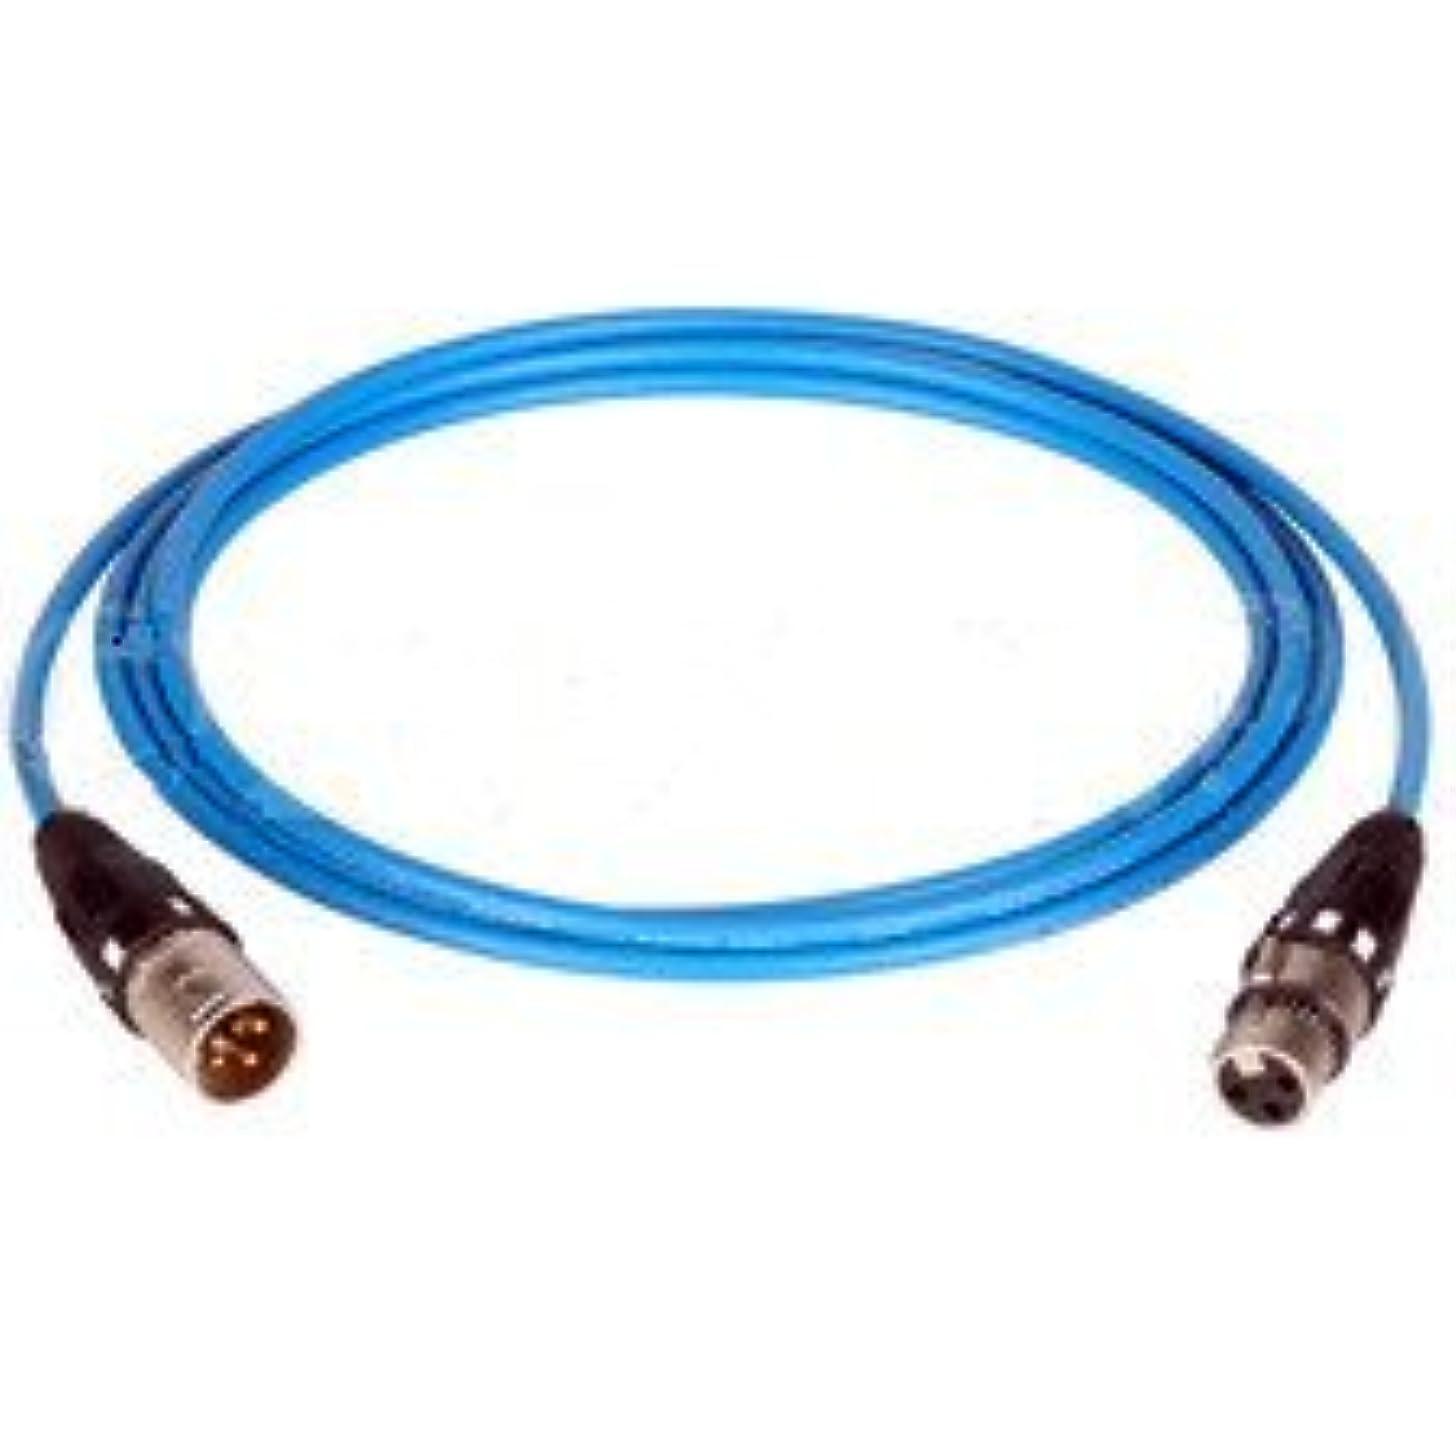 Sescom 10ft Digital Audio Cable XLR Male to XLR Female-by-tecnec